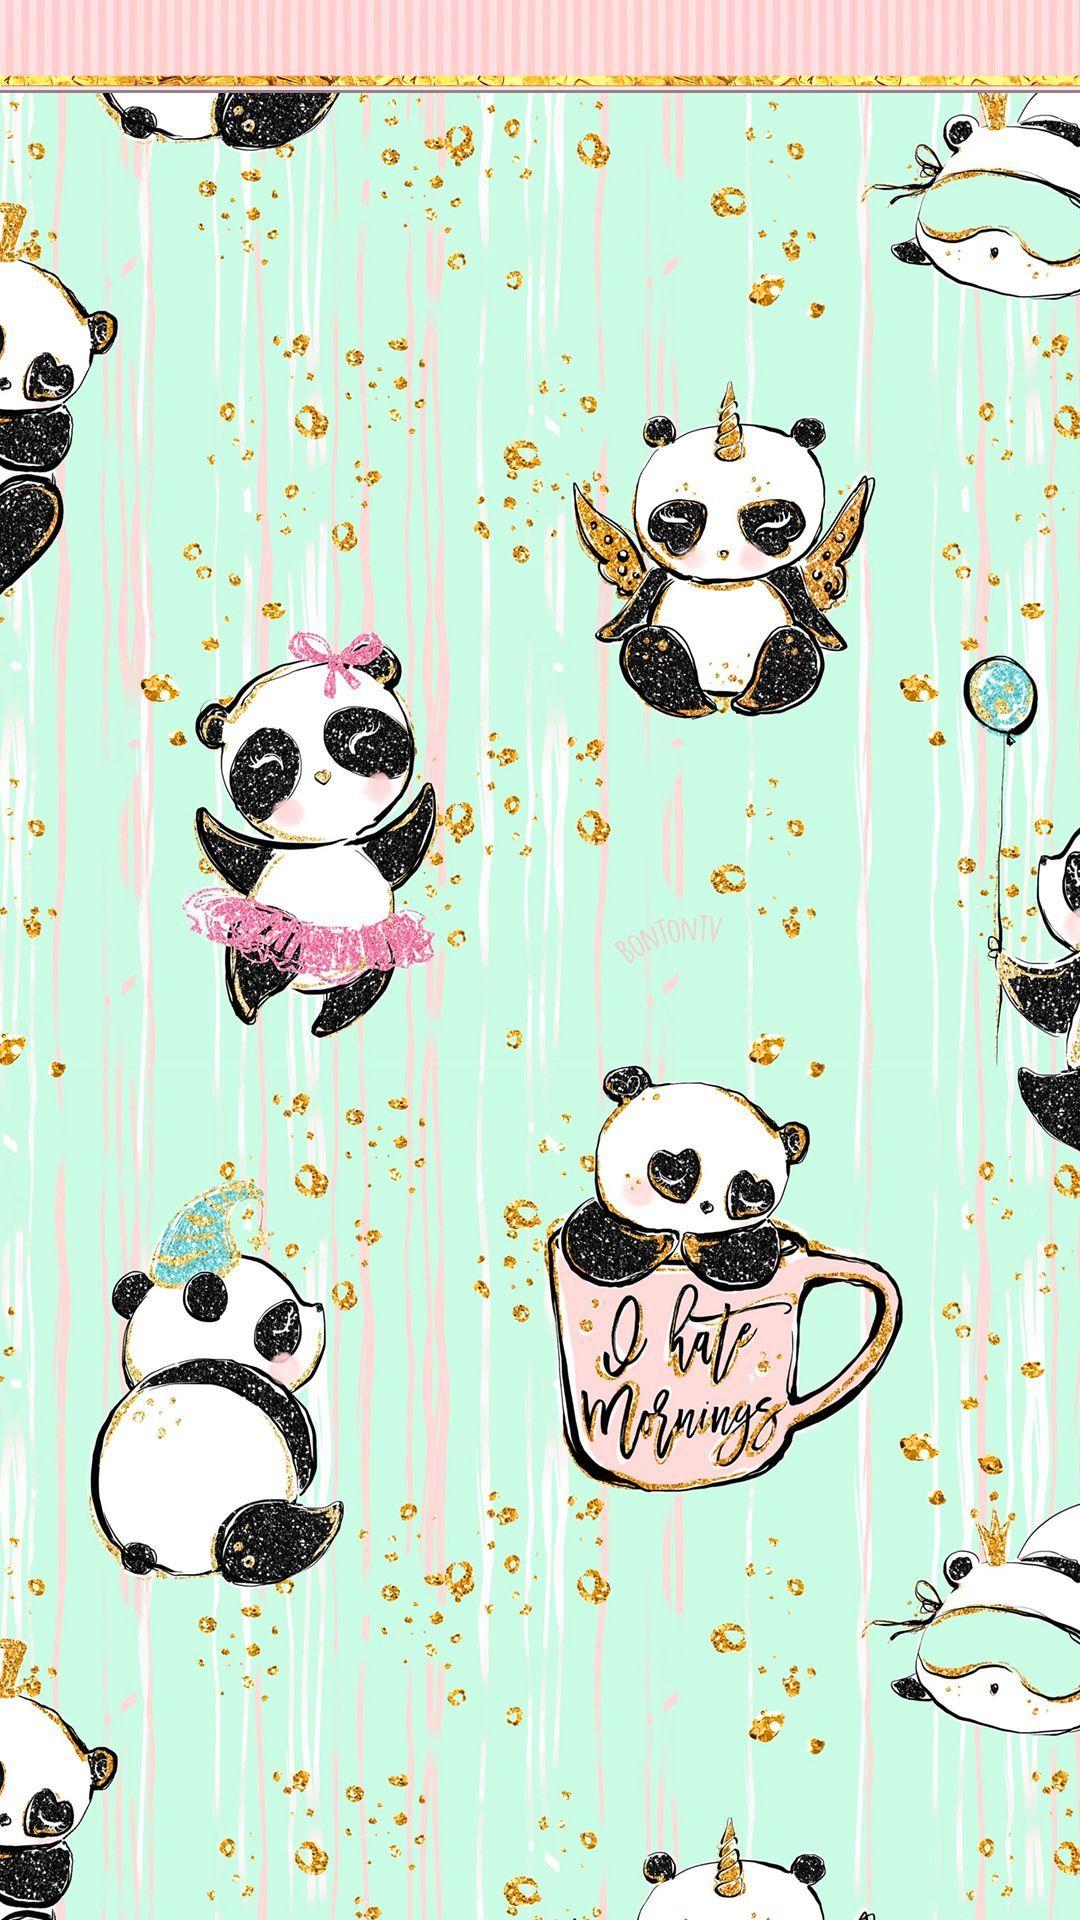 Phone Wallpapers Hd By Bonton Tv Free Download 1080x1920 Iphone Wallpapers Androi Cute Panda Wallpaper Panda Wallpaper Iphone Iphone Wallpaper Glitter